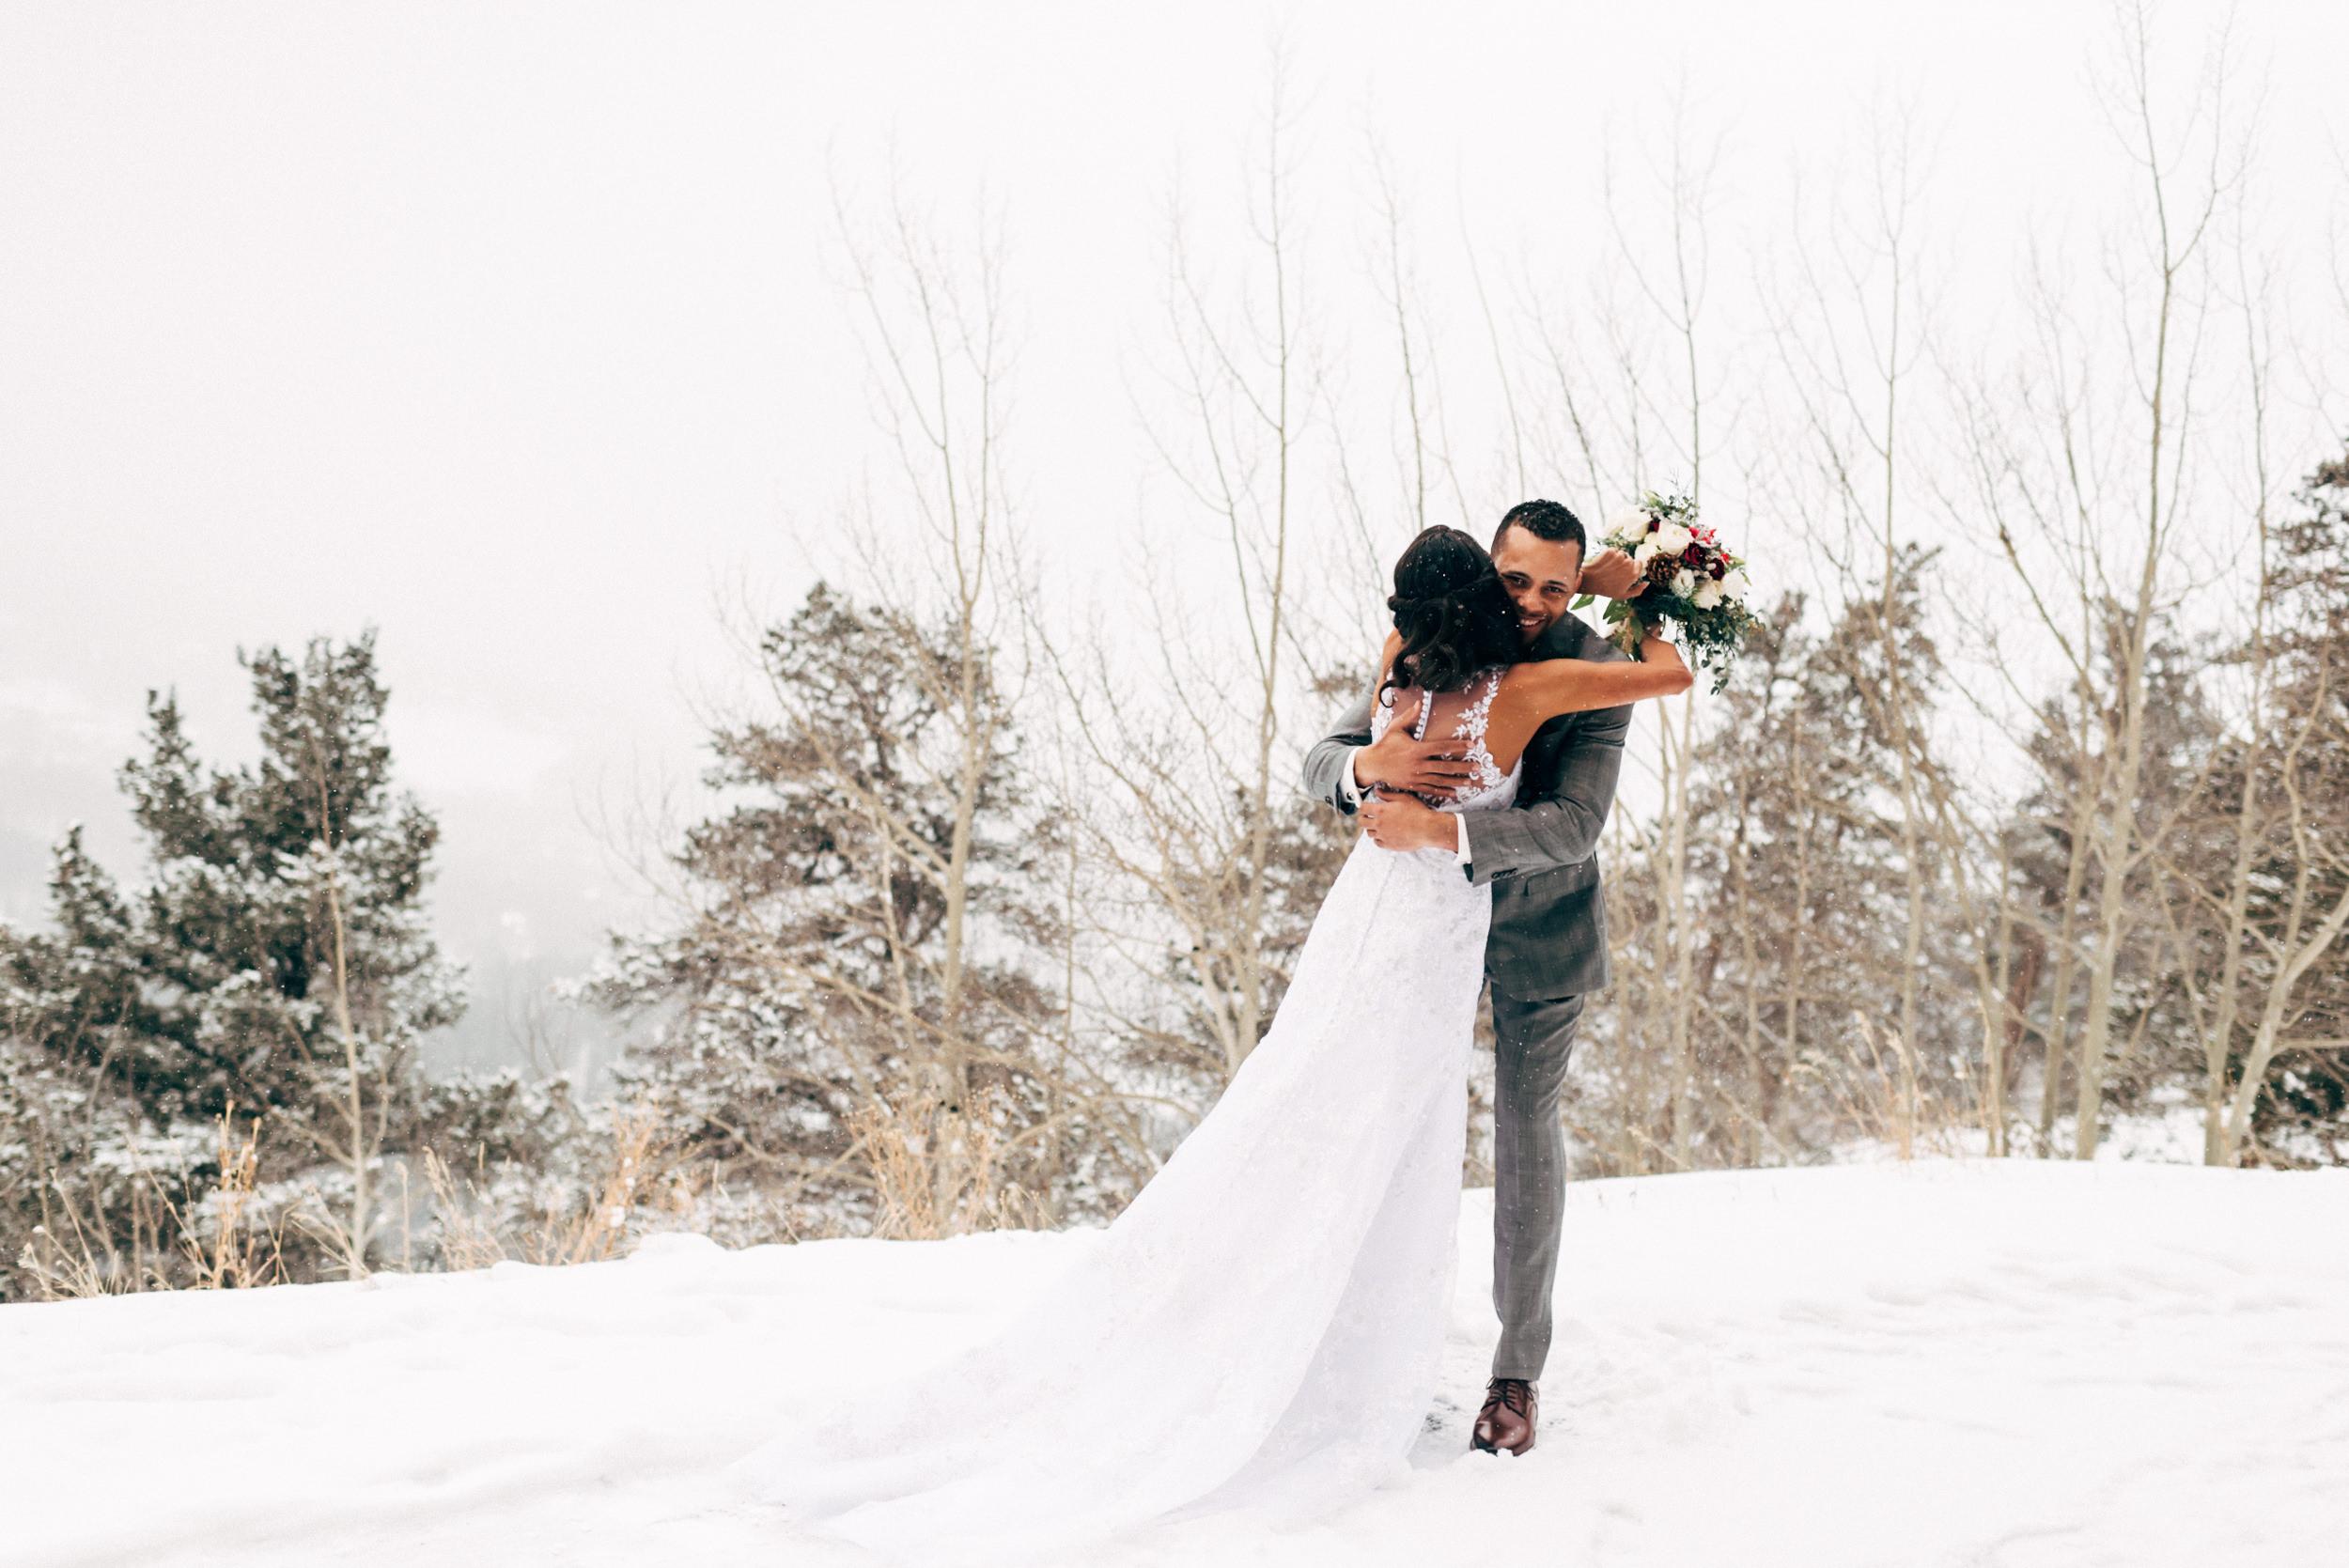 Bride and groom embracing on a winter wedding Colorado mountain side. Colorado Wedding Photographer.